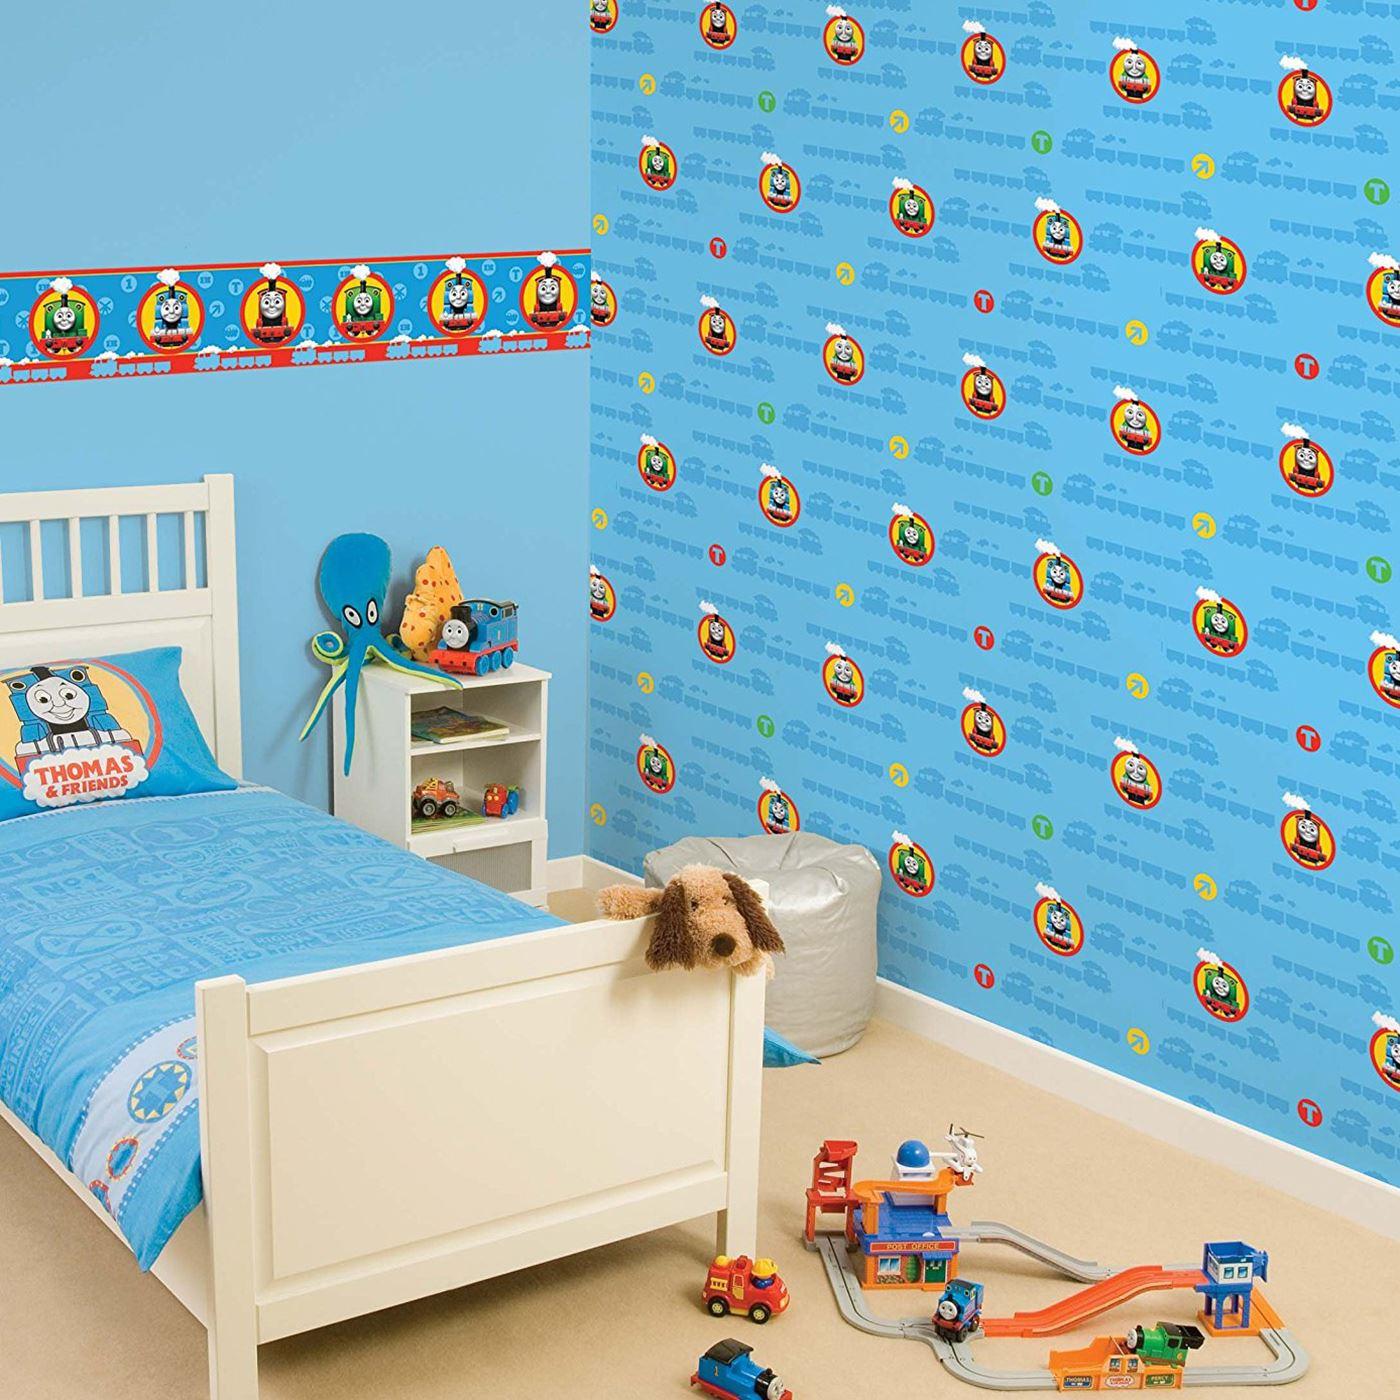 Kids Boys Wallpaper Borders Room Decor Disney Cars Star Wars Spiderman Ebay